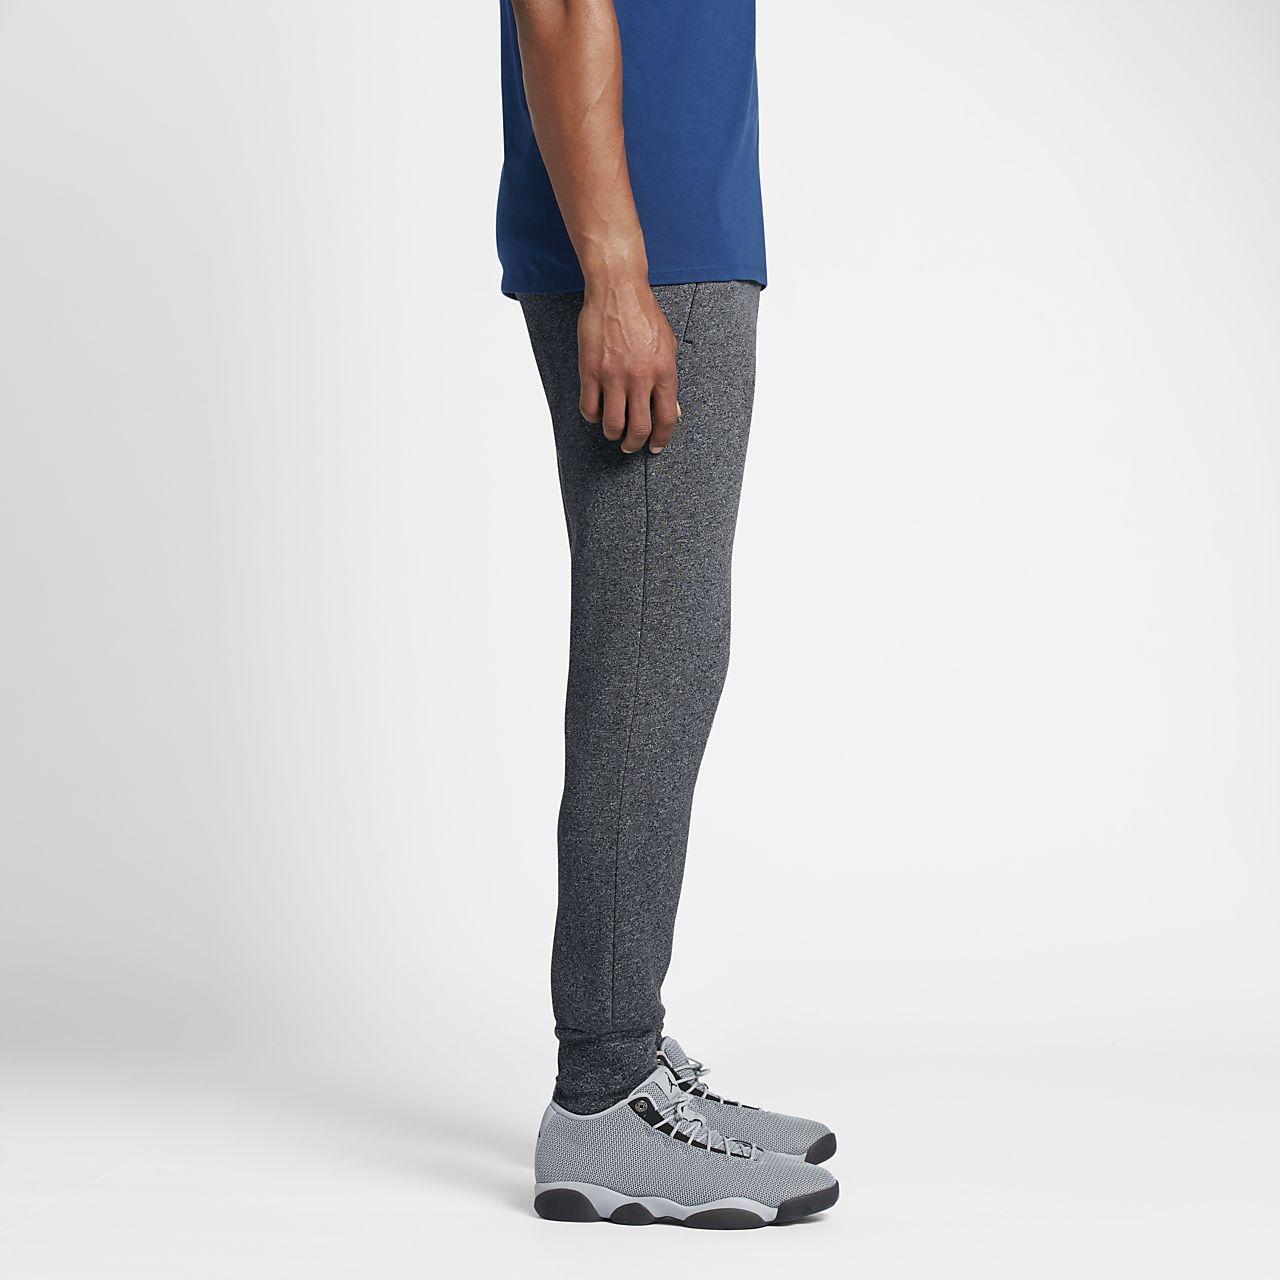 88e0feb485735 Pantalones de entrenamiento para hombre Jordan Icon Fleece Cuffed ...